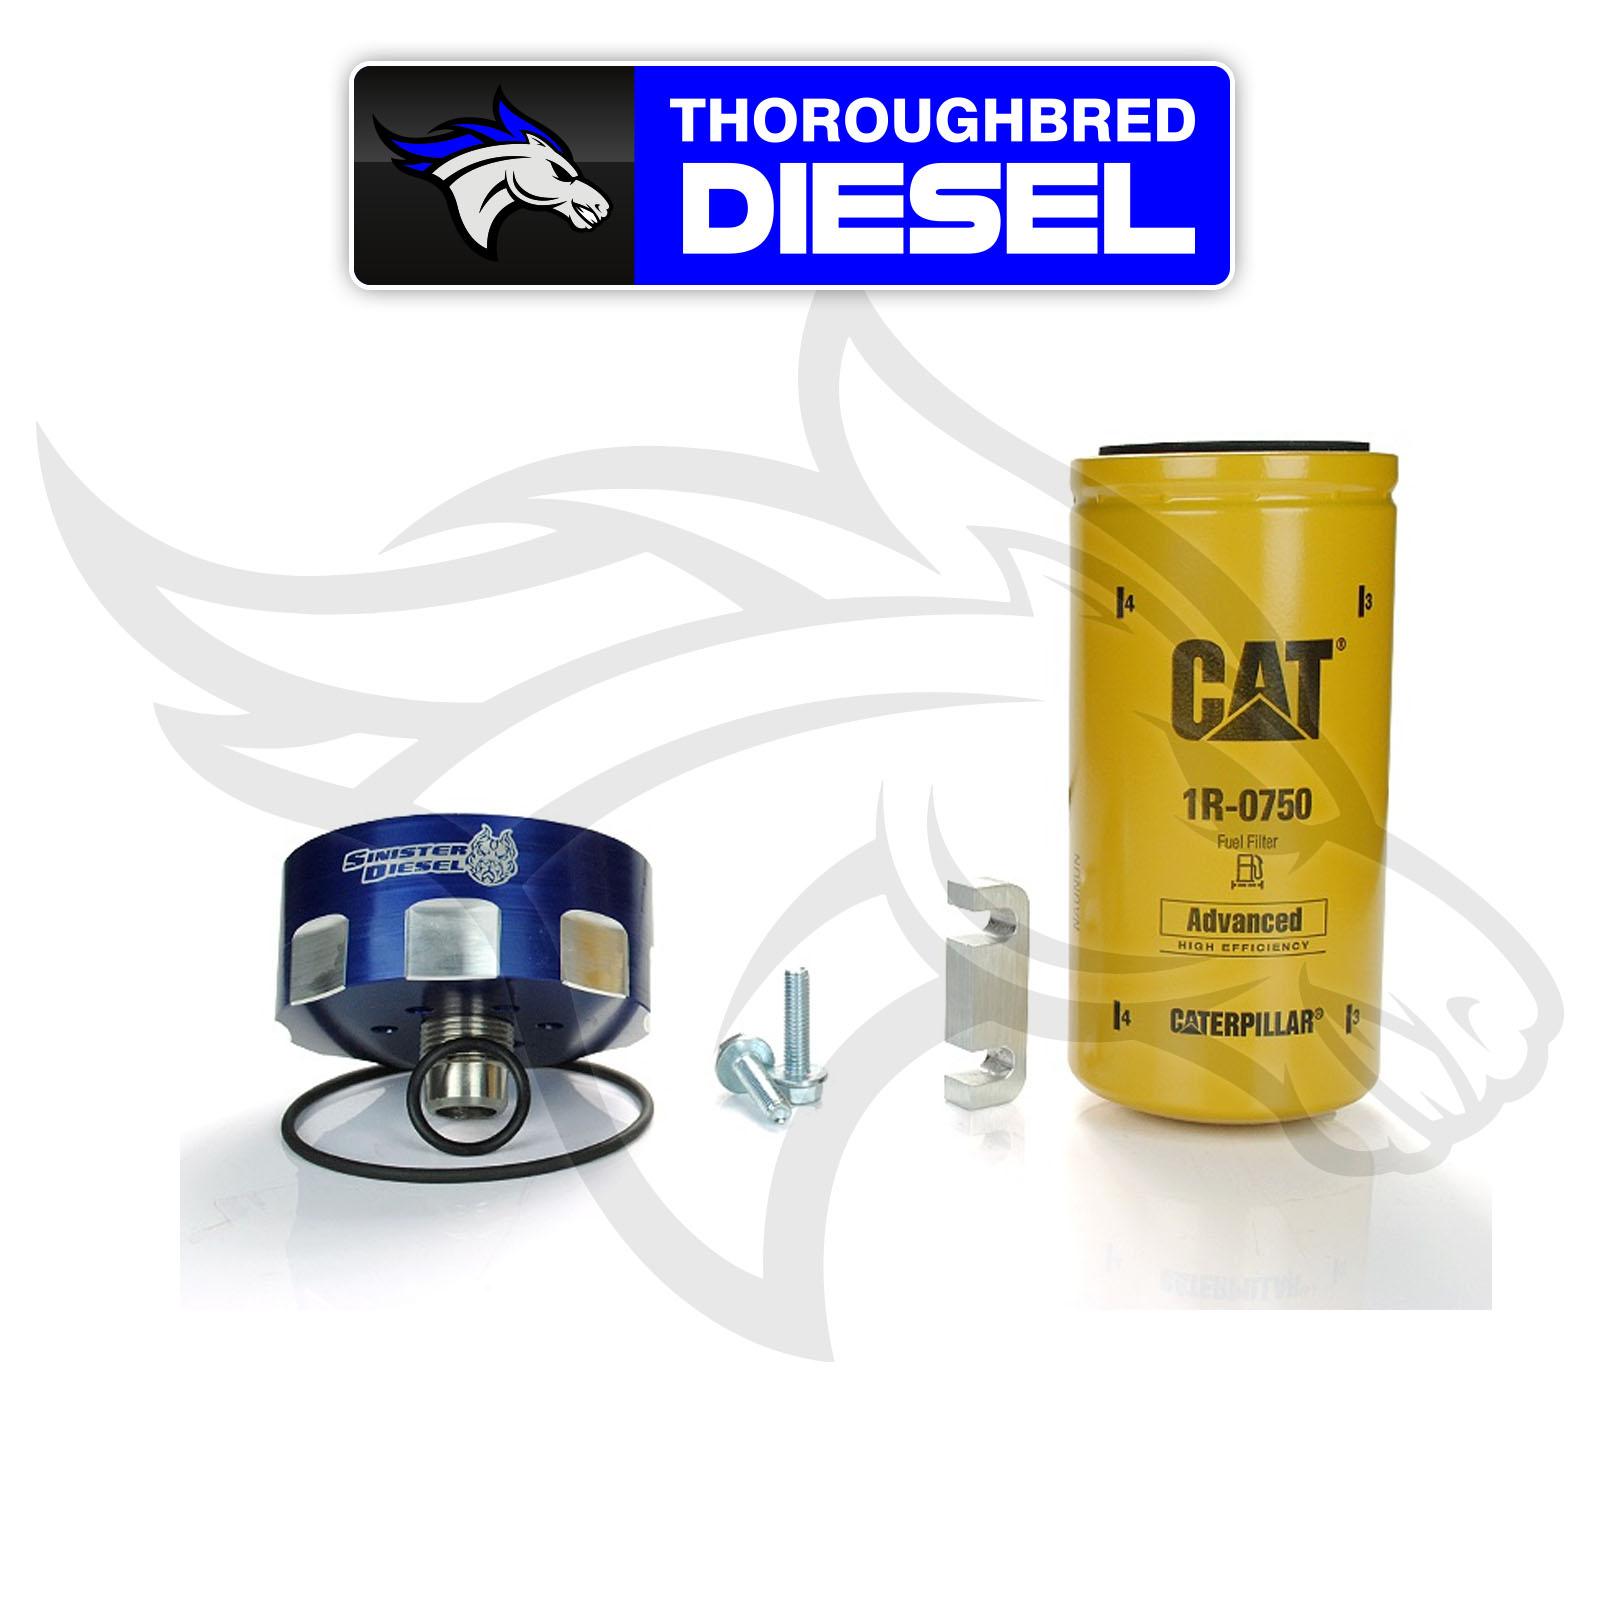 duramax cat fuel filter duramax fuel filter housing rebuild kit sinister diesel cat fuel filter adapter kit for 6.6l duramax sd-cat-dmax | ebay